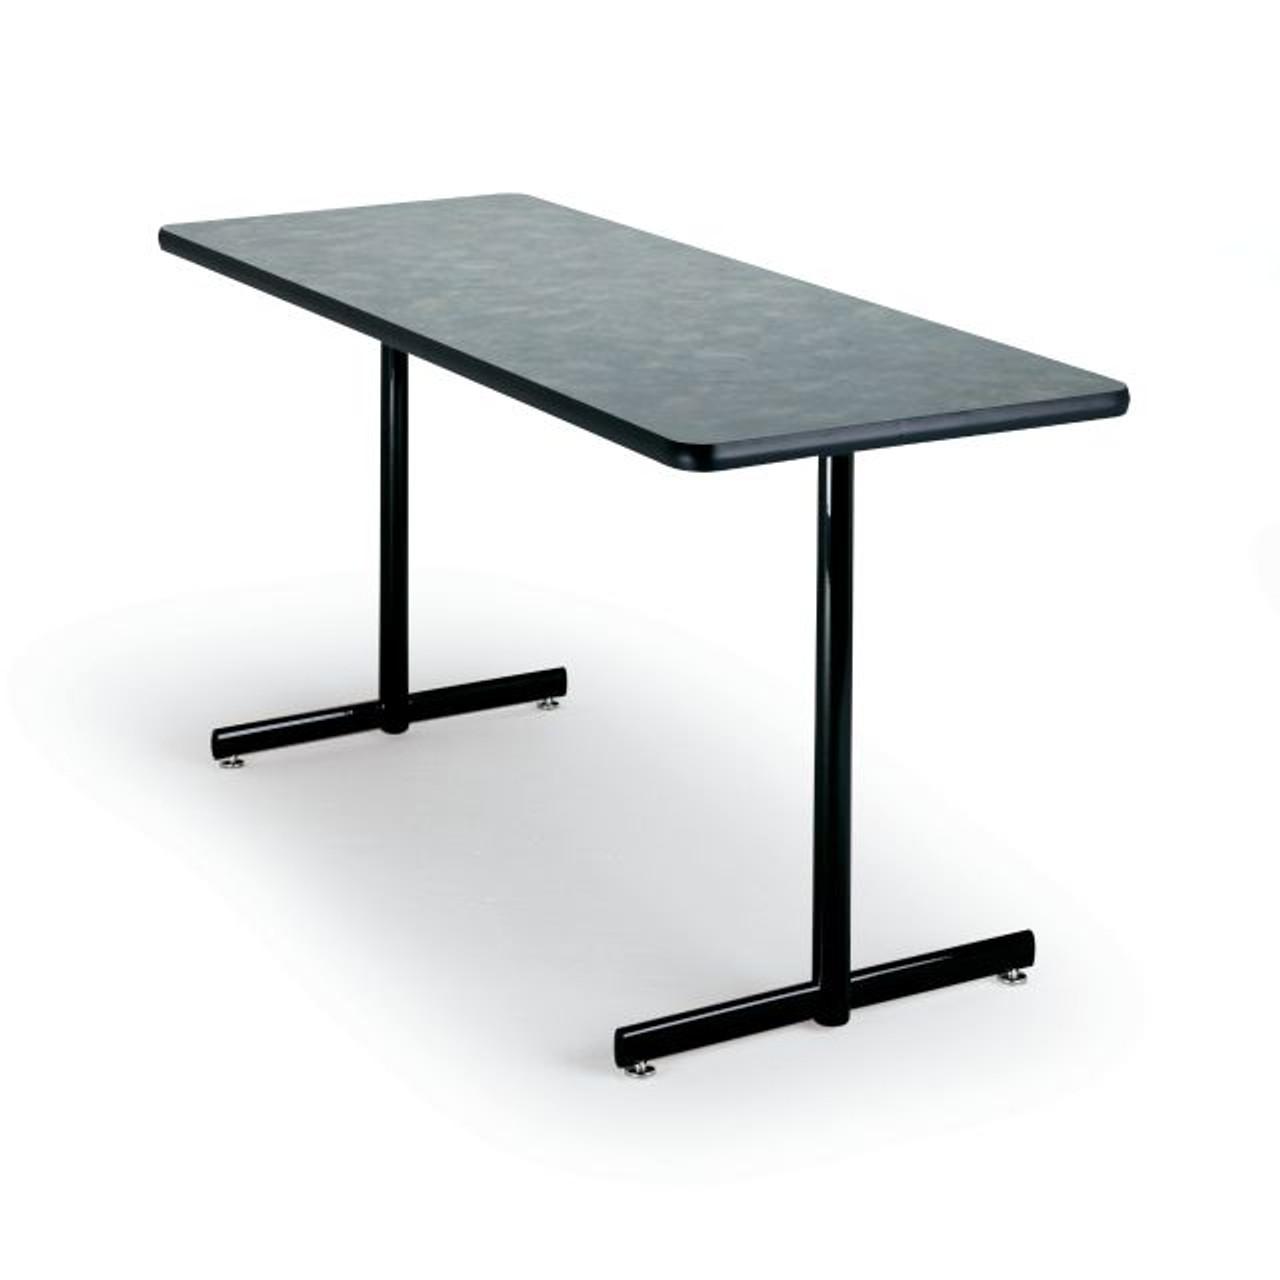 P36st Portico Rectangular T Base Fixed Height Folding Leg Table 36 X